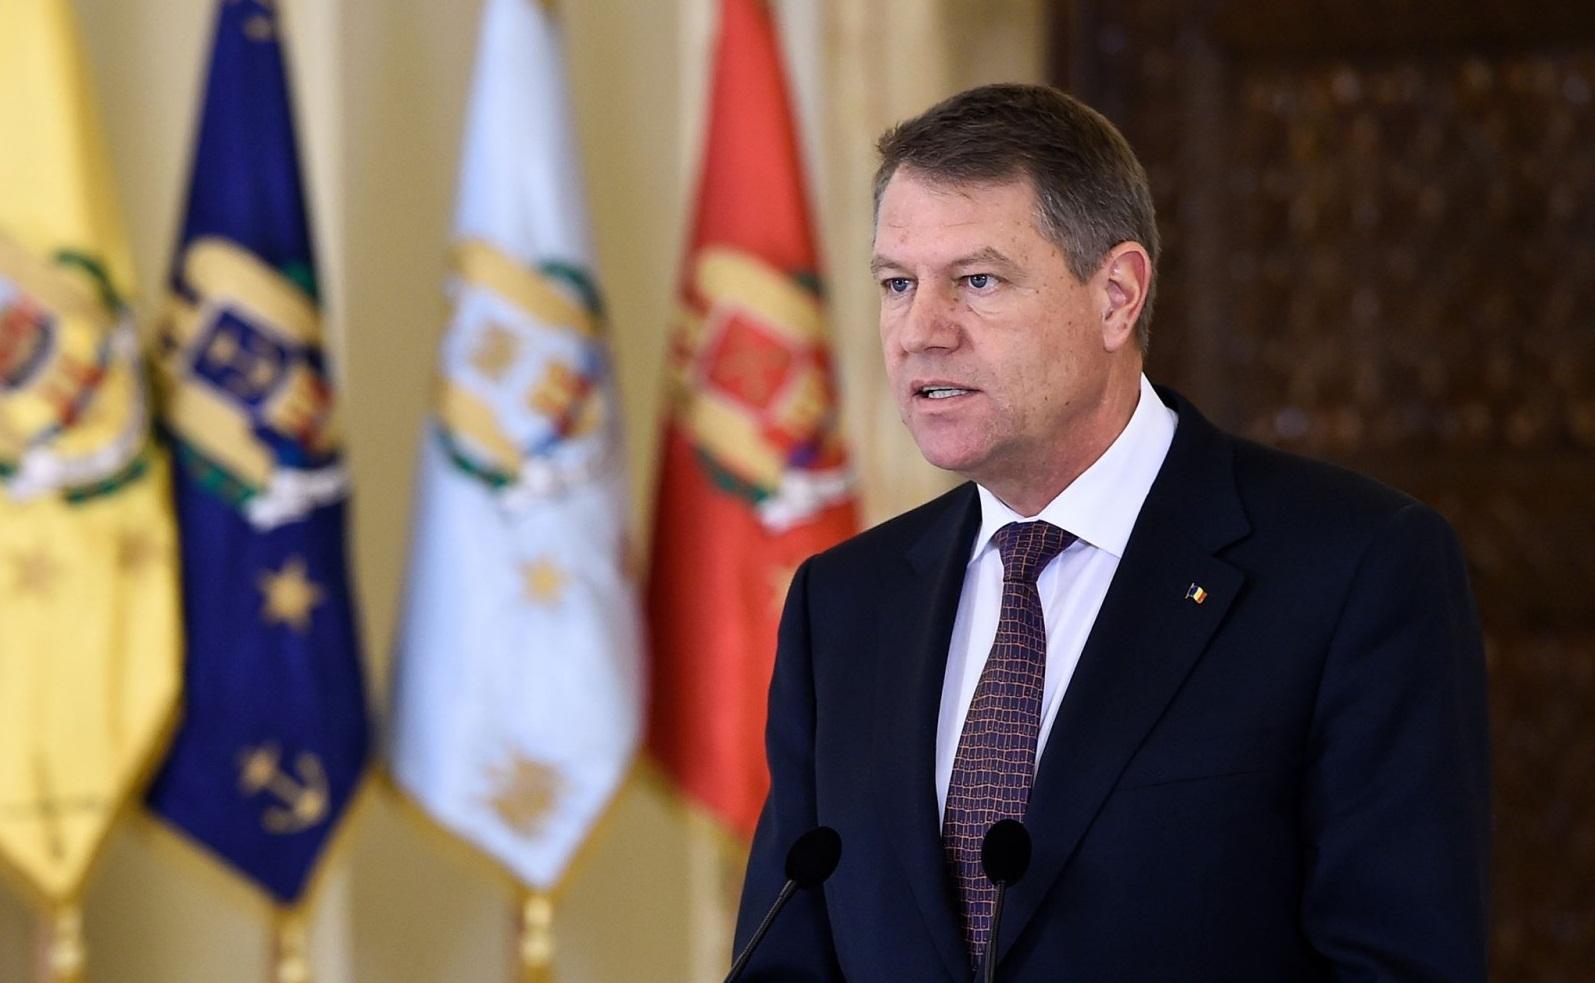 Presedintele Iohannis